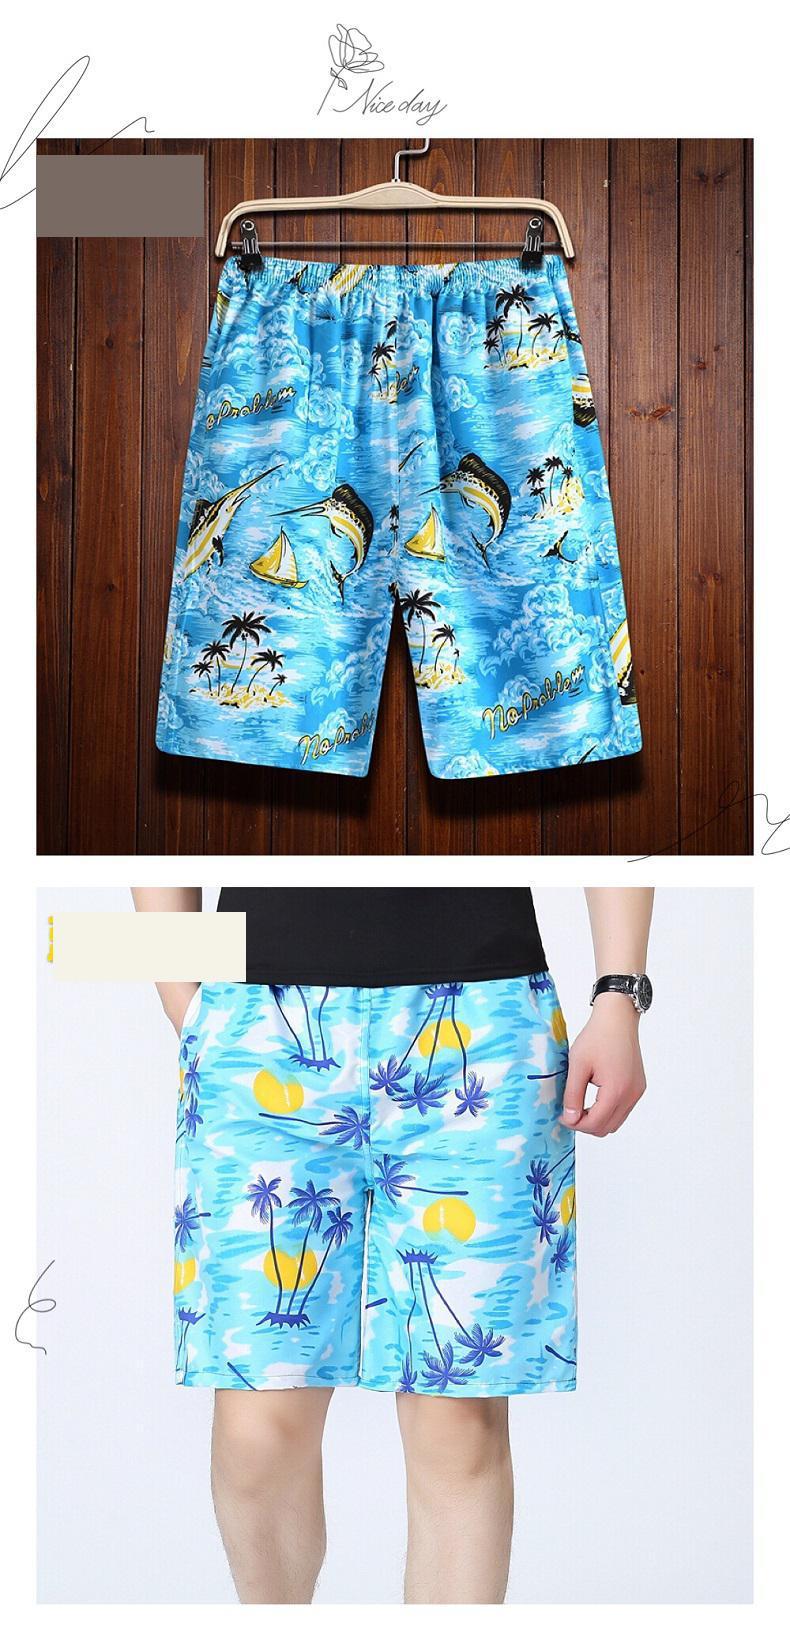 10 Patterns Camouflage Compression Shorts Men Summer Clothing Board Shorts Nylon Bottom Men Side Pockets Men's Swimwear 6